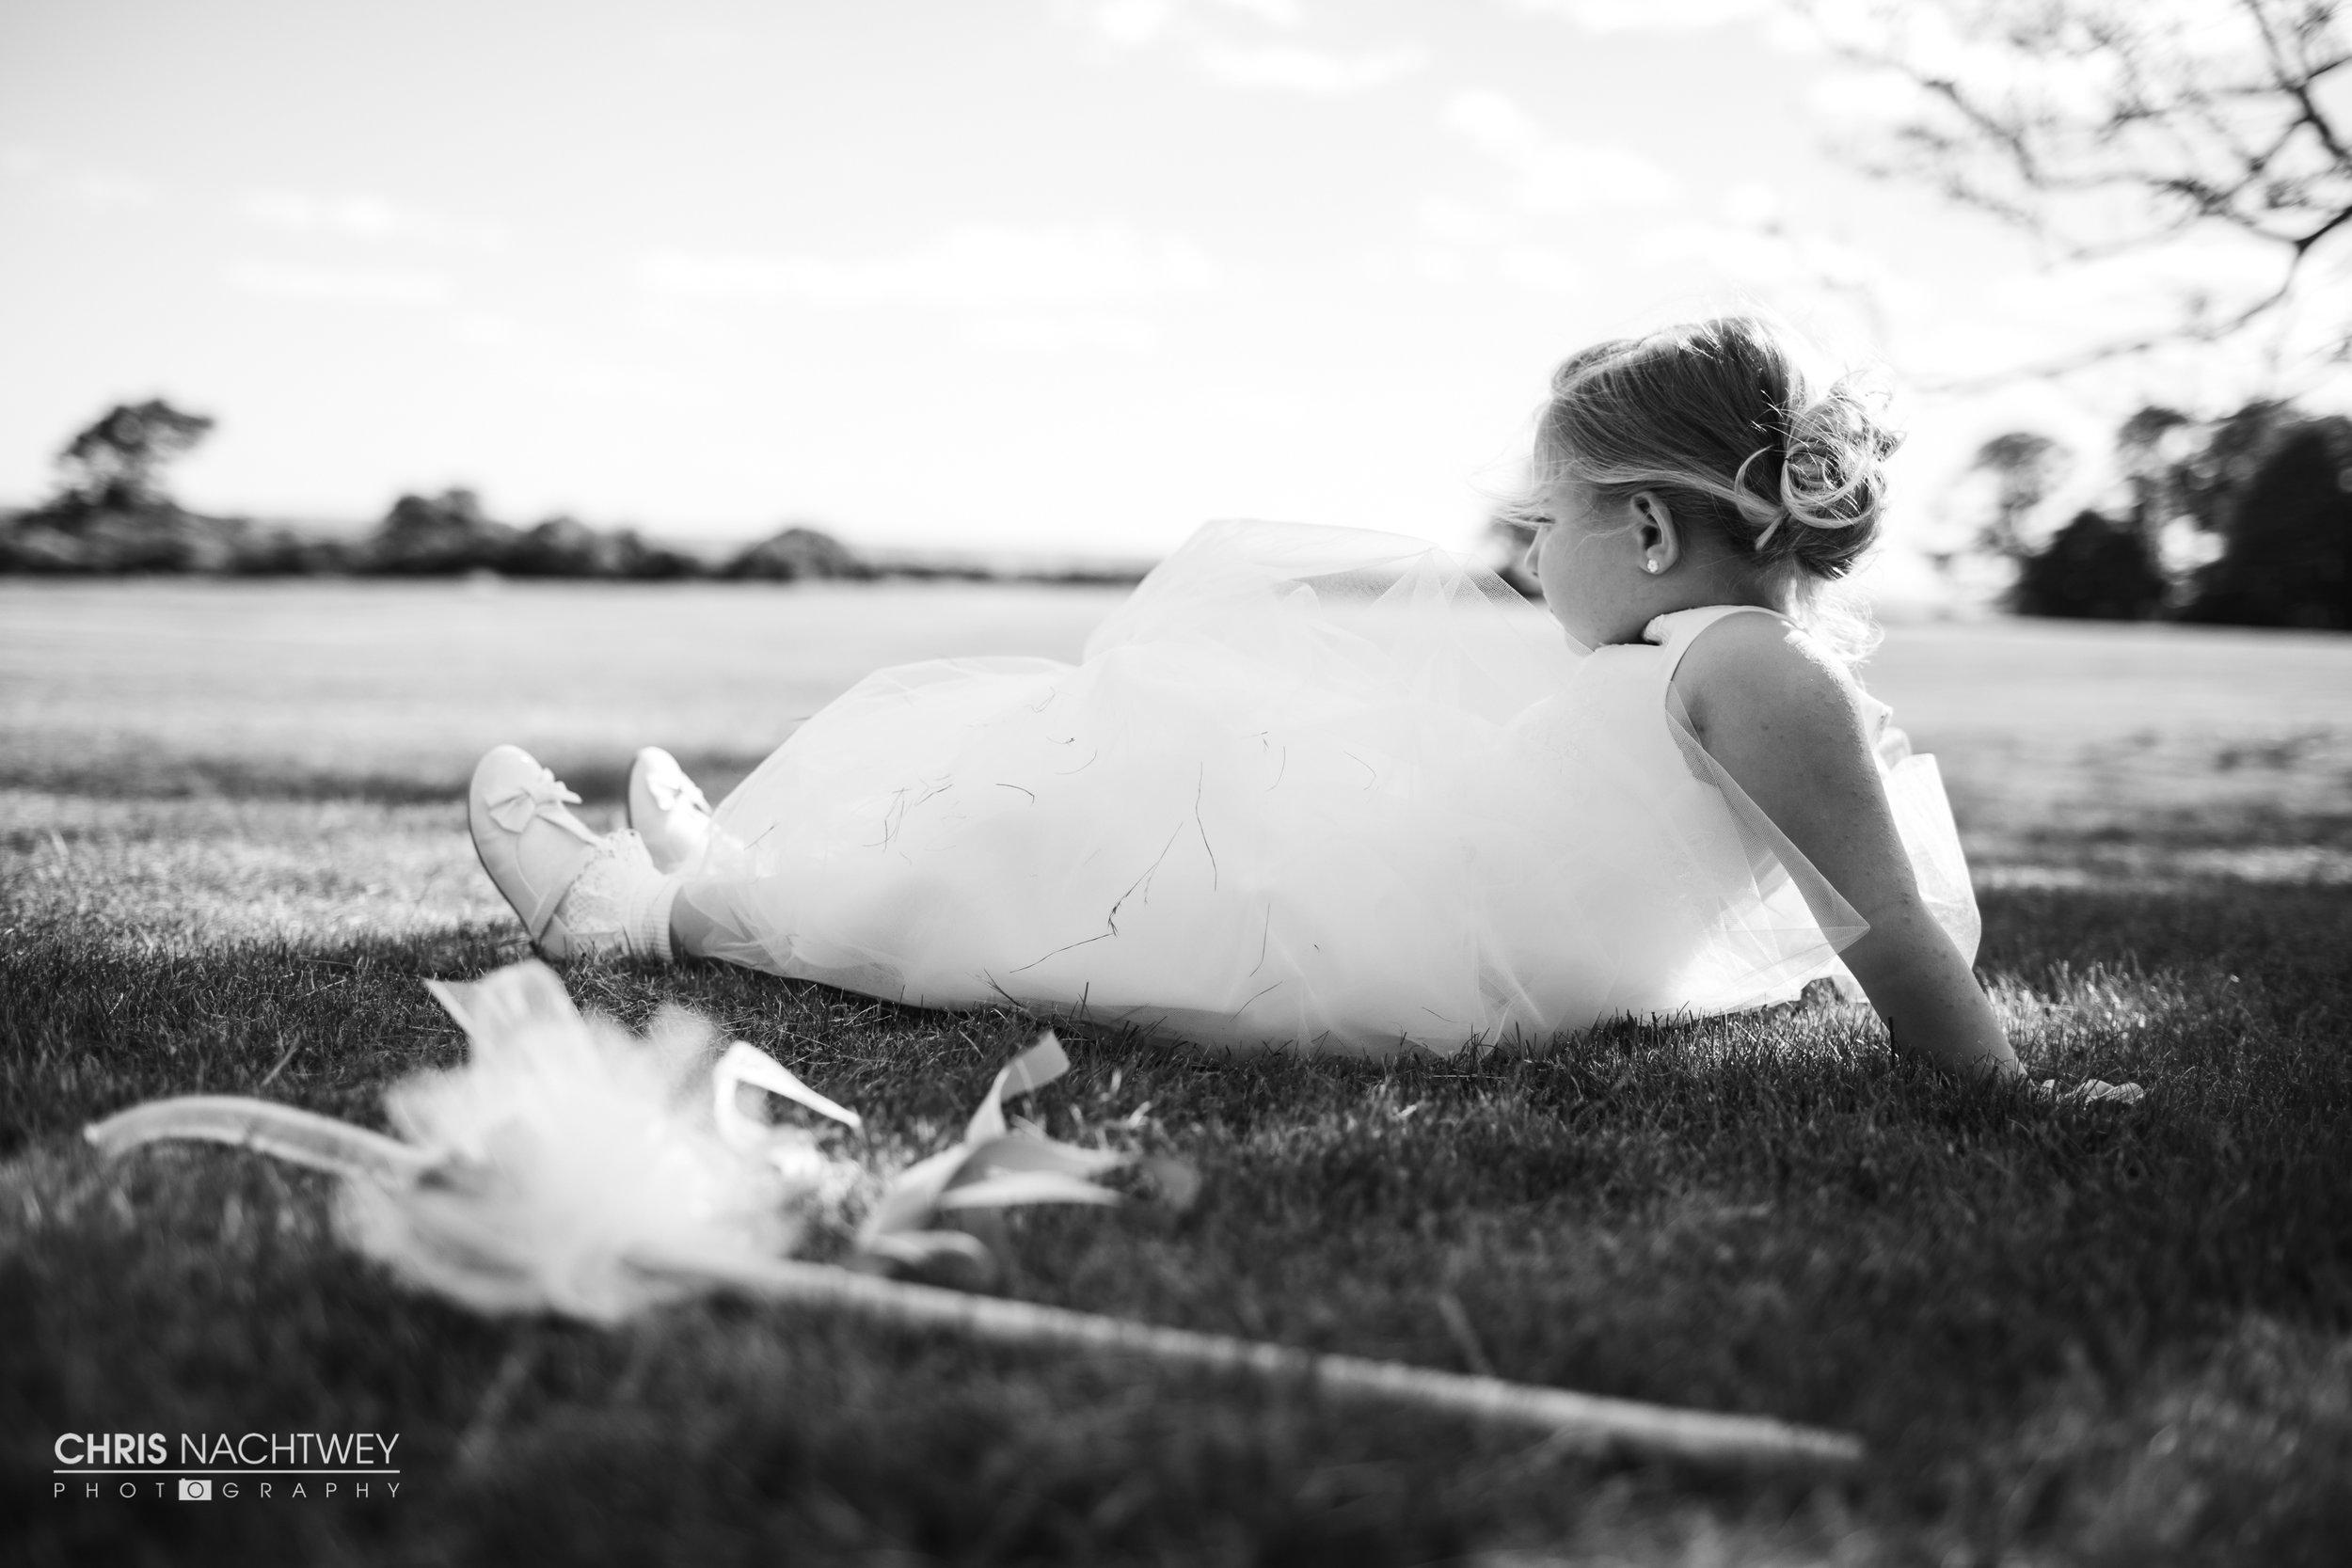 mystic-artistic-wedding-photographer-chris-nachtwey-2017-16.jpg